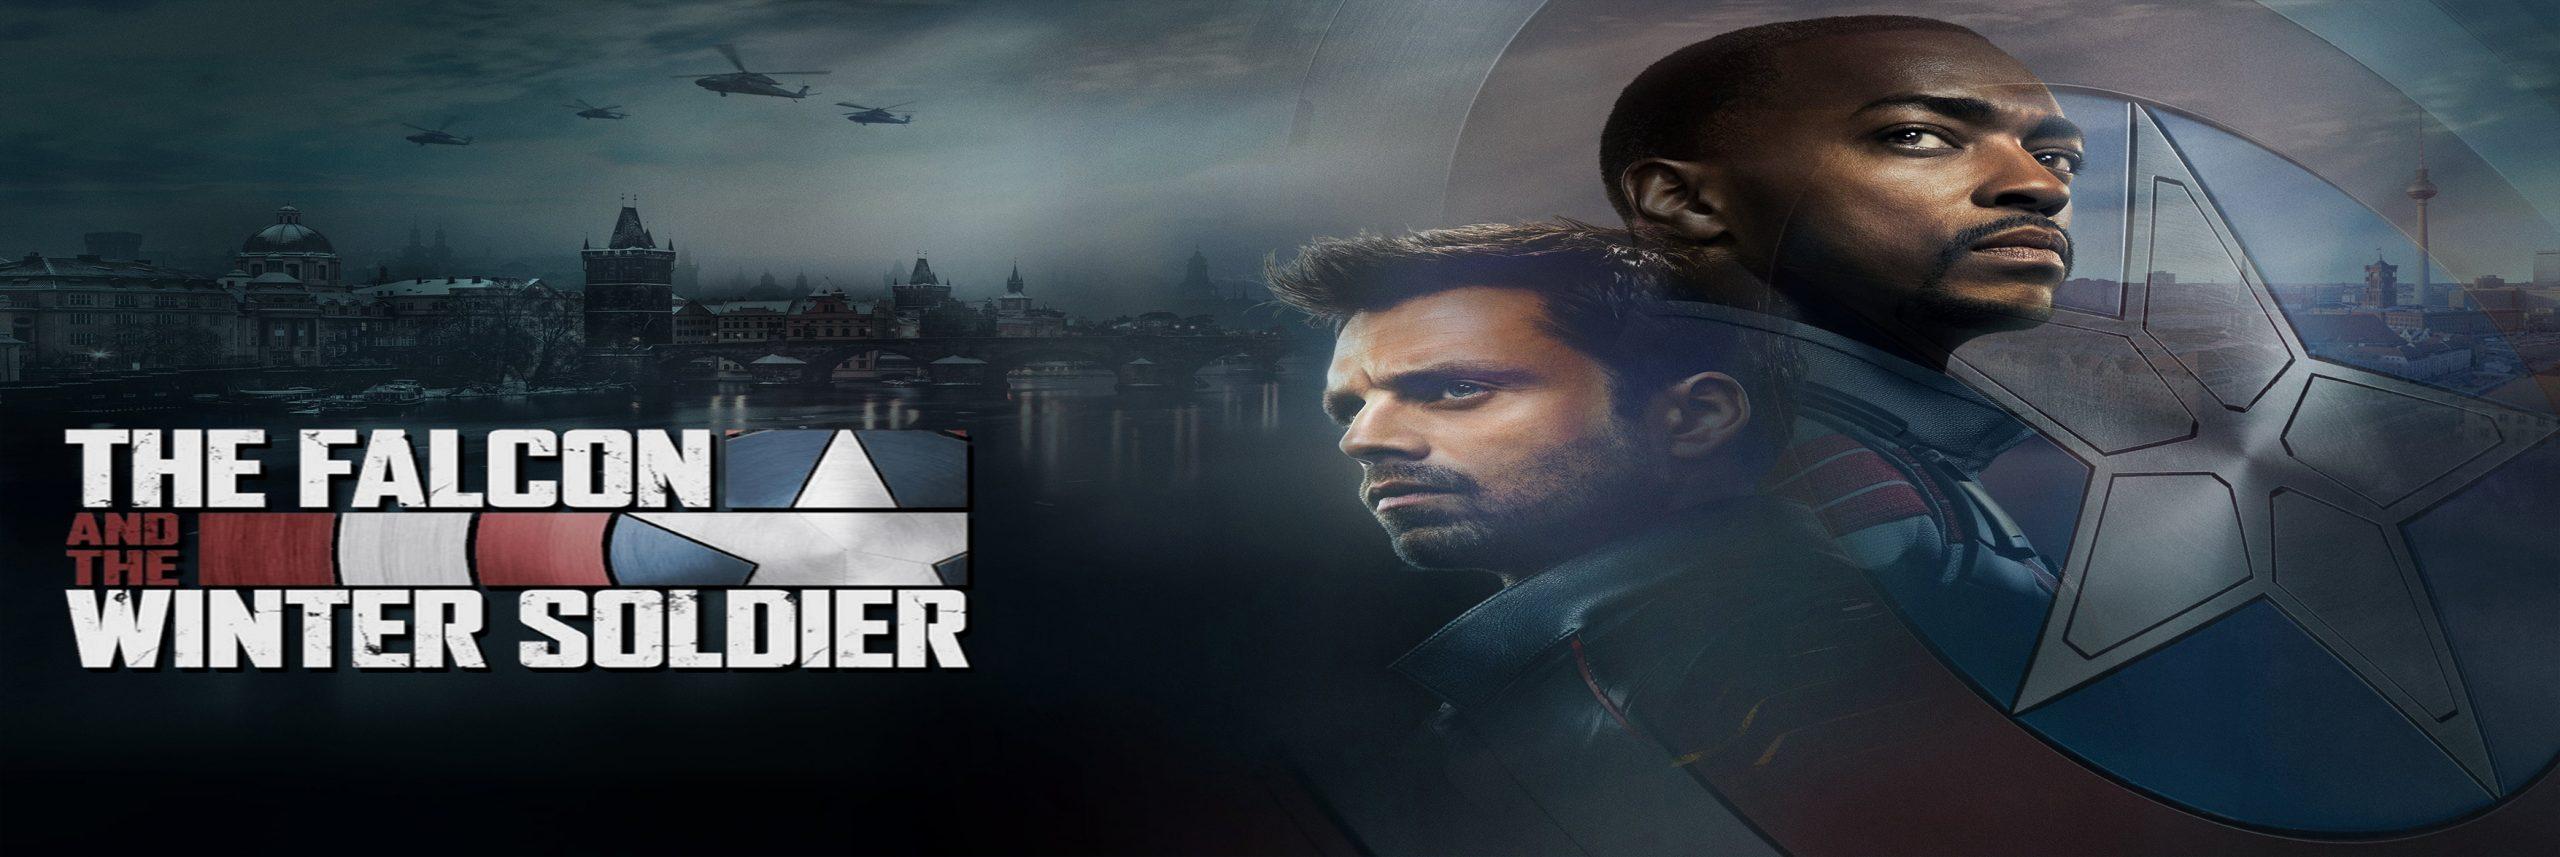 فالکون و سرباز زمستان – The Falcon And The Winter Soldier